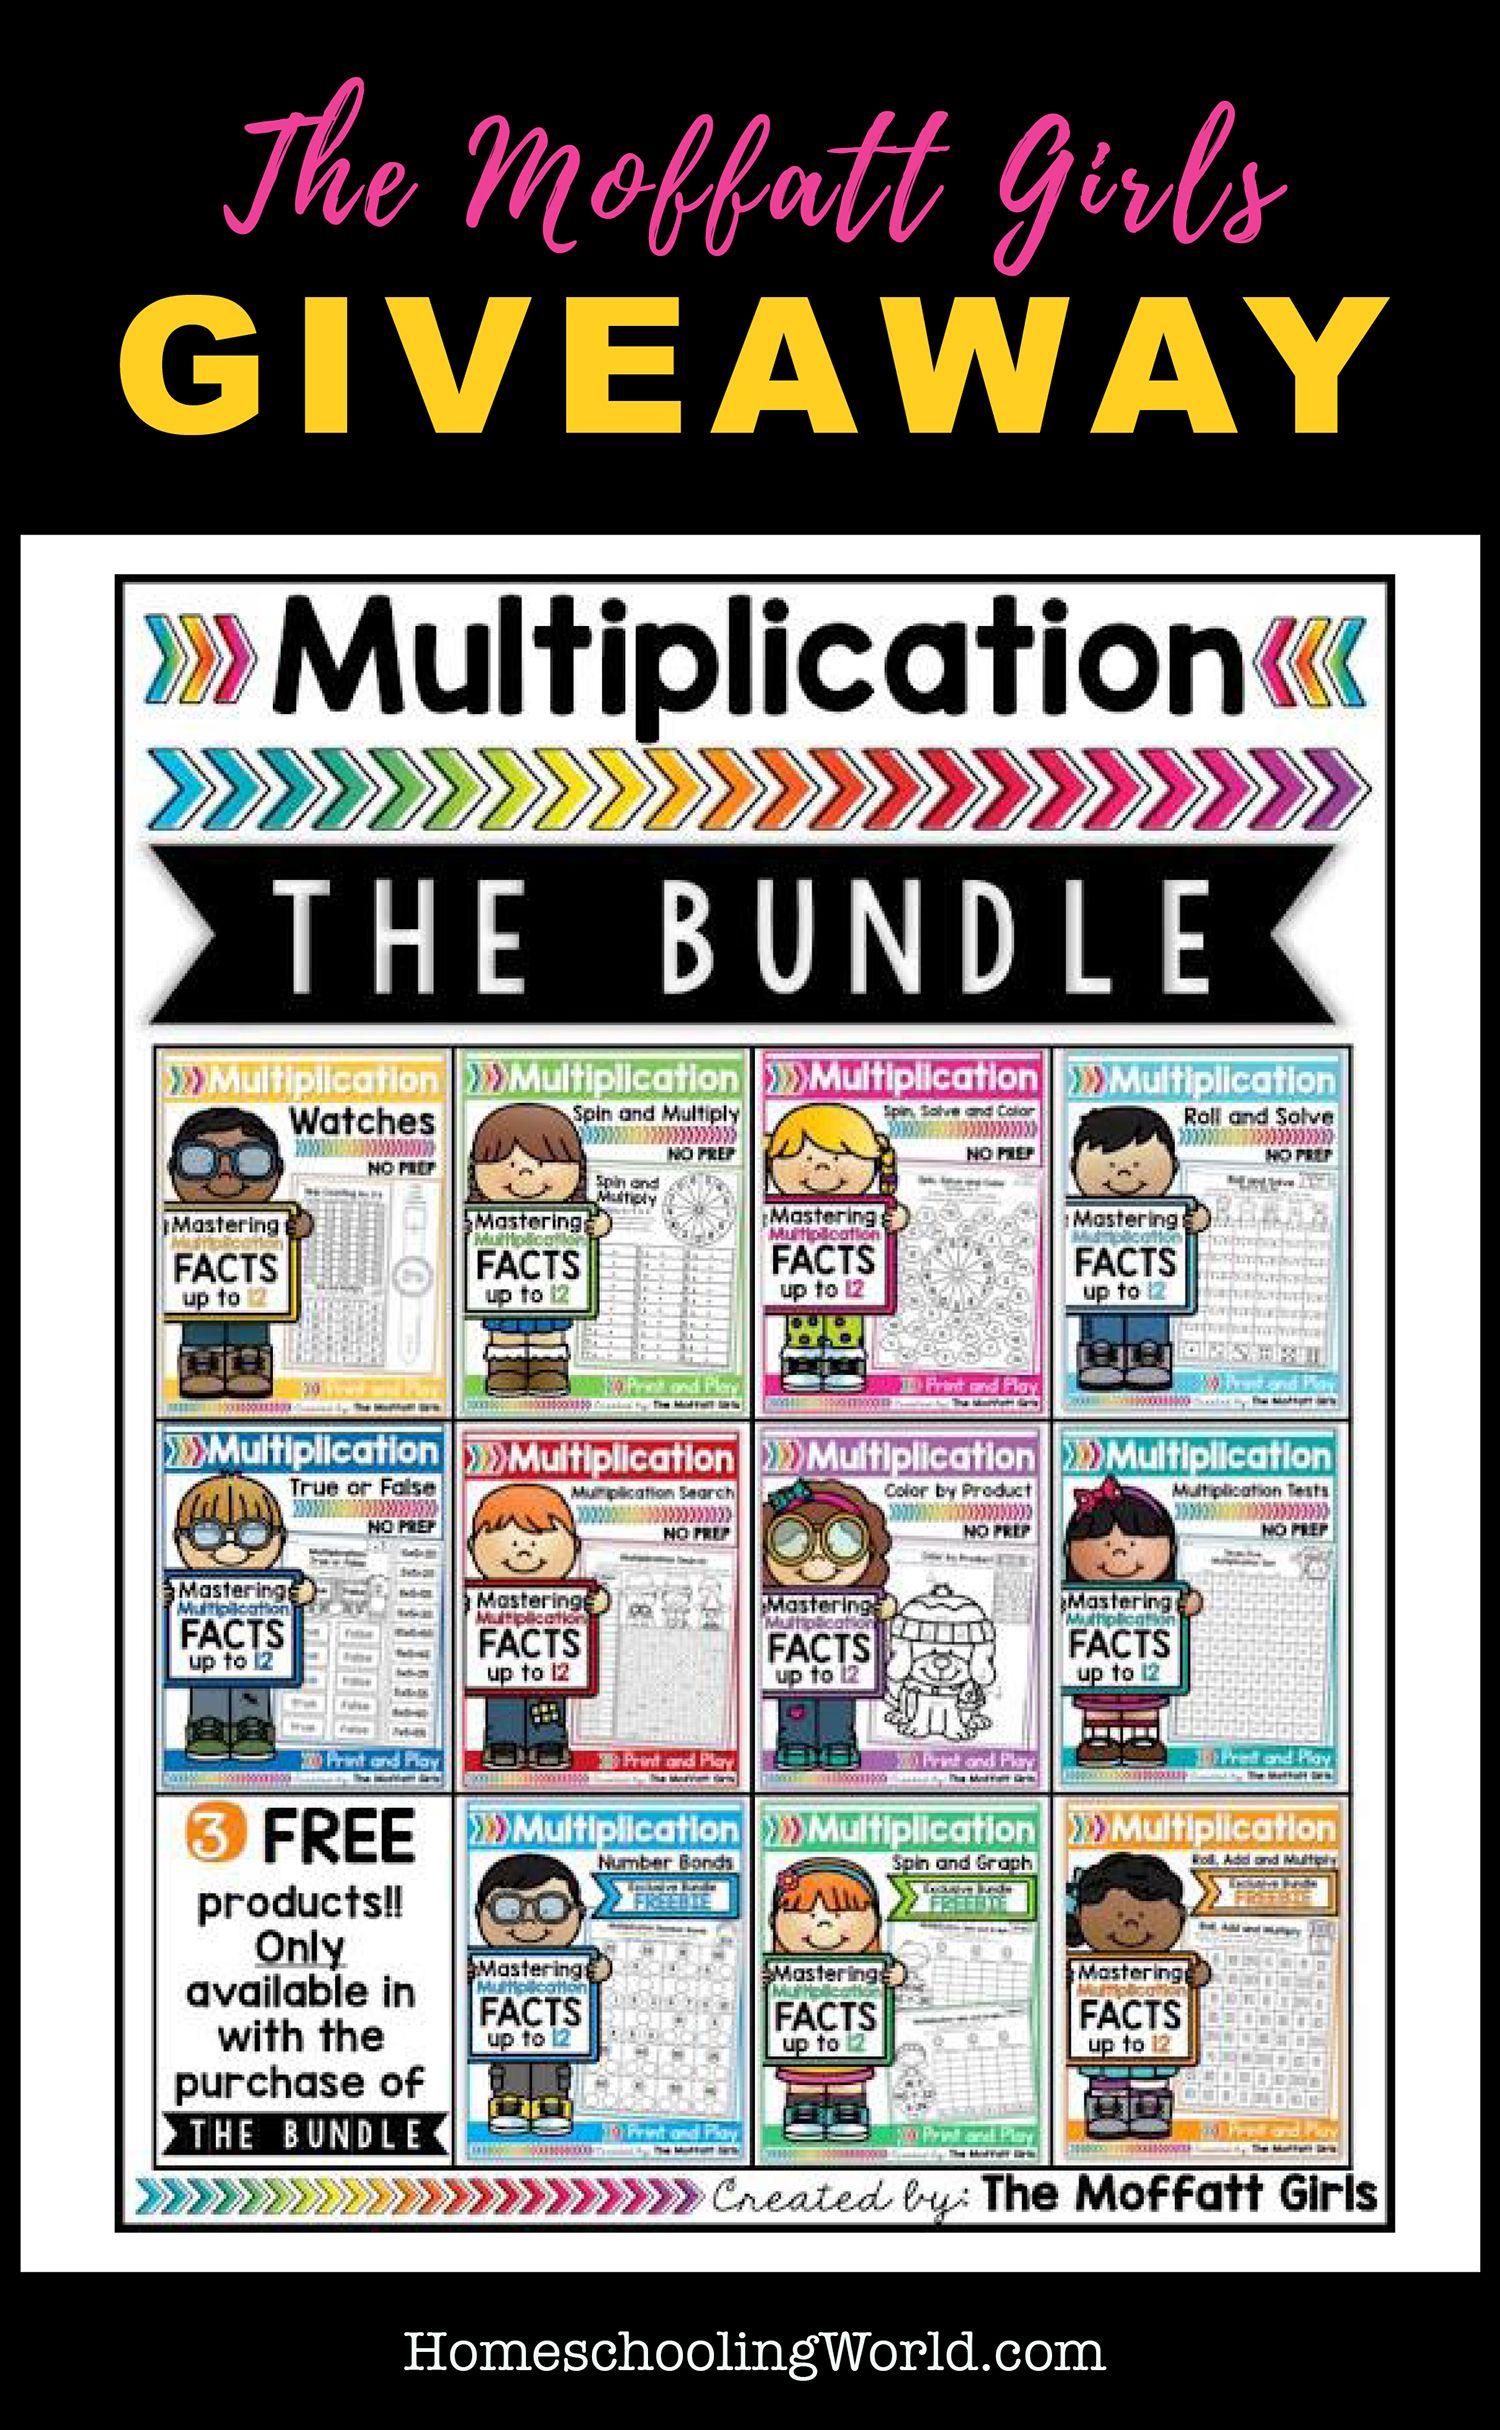 Win A Multiplication Bundle From The Moffatt Girls